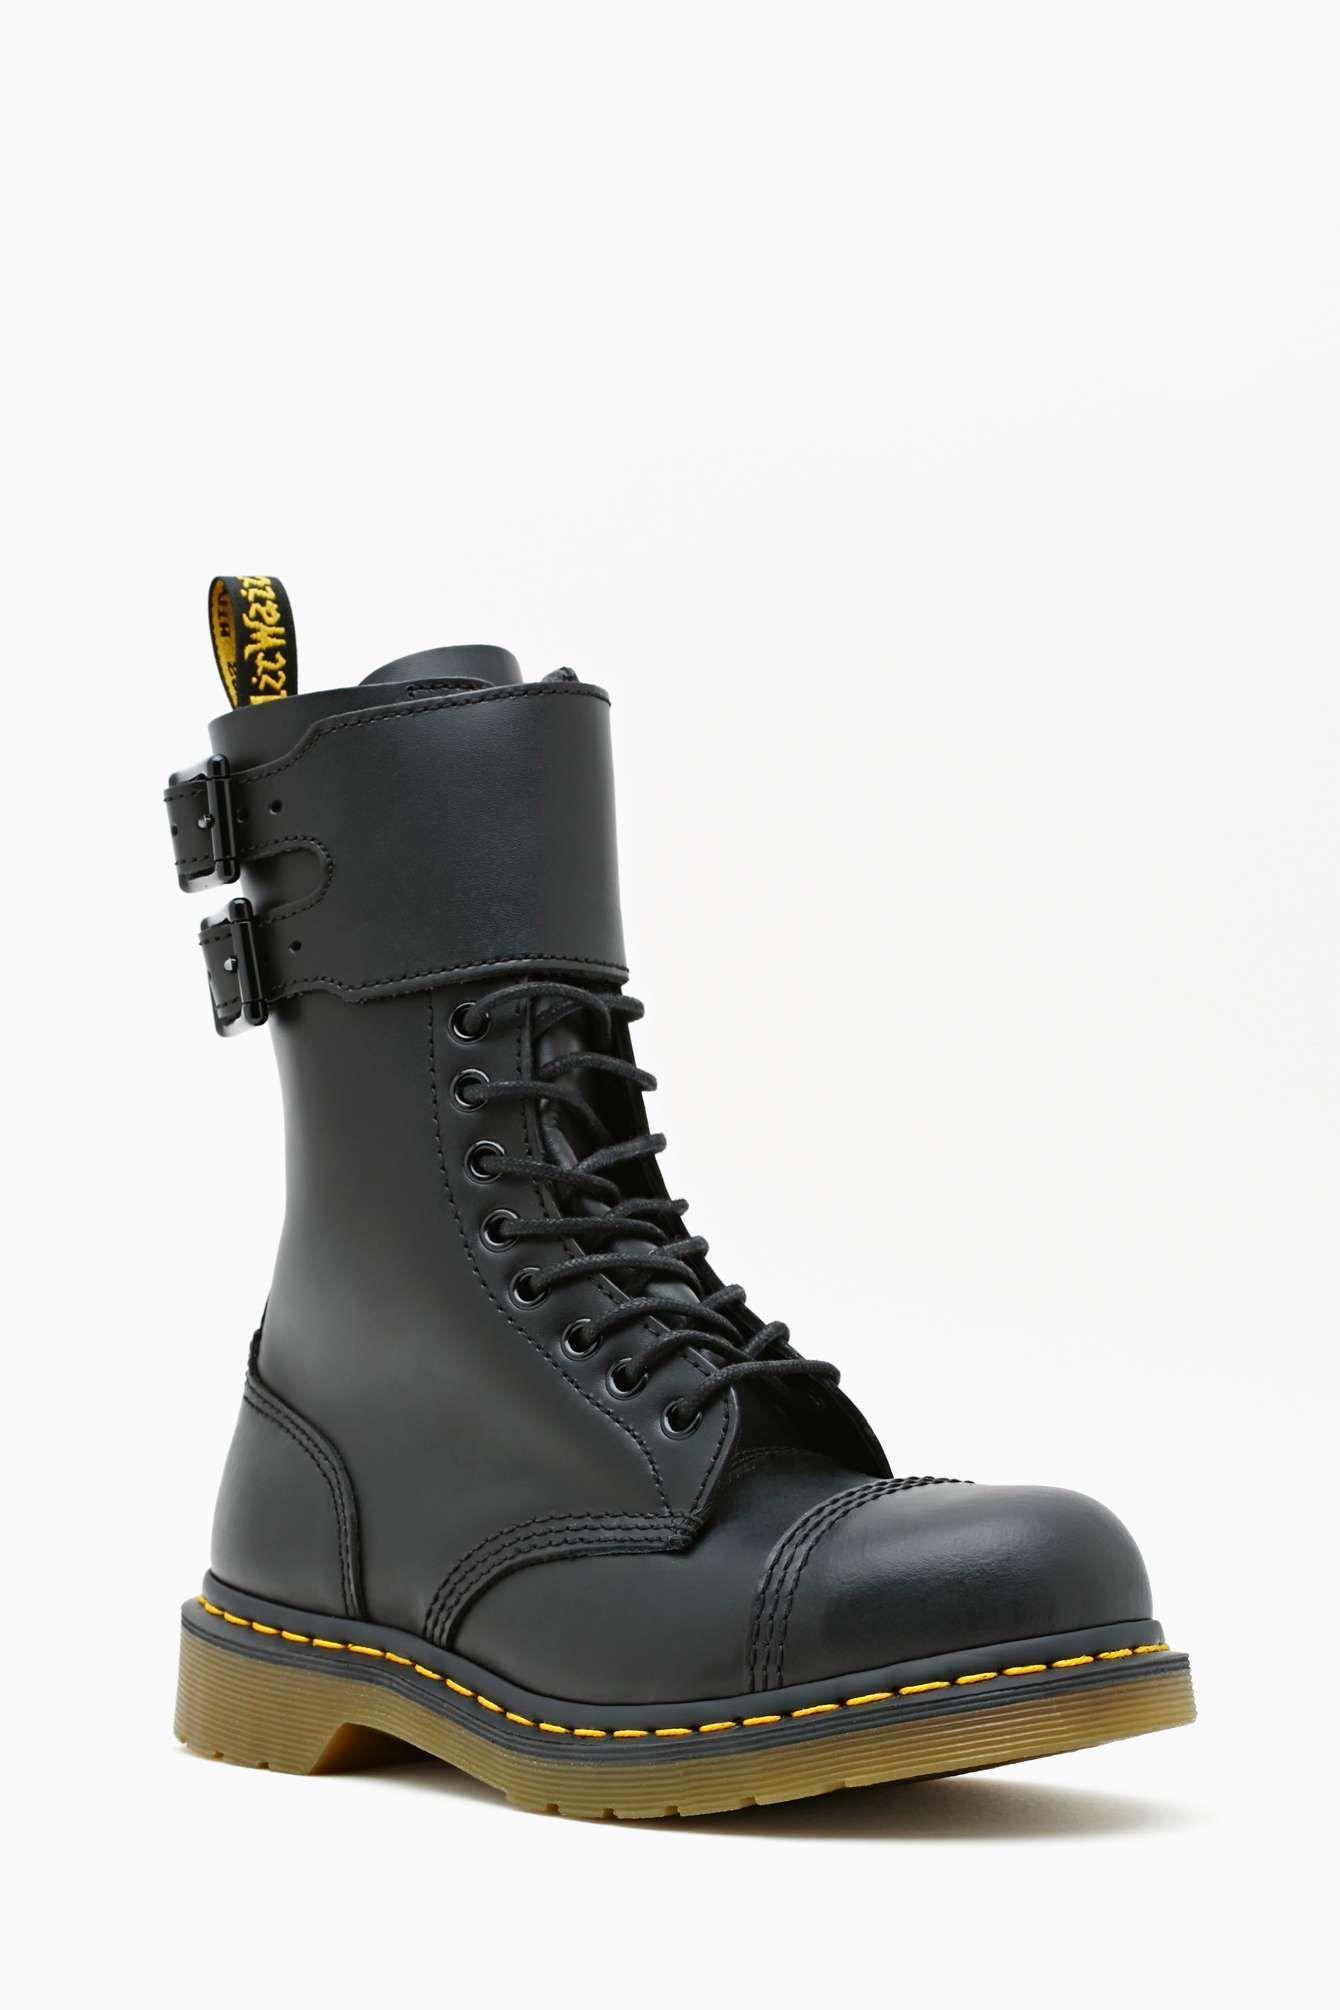 Dr. Martens Caden Combat Boot   Shop Shoes at Nasty Gal!   Shoes ... aff36552268d